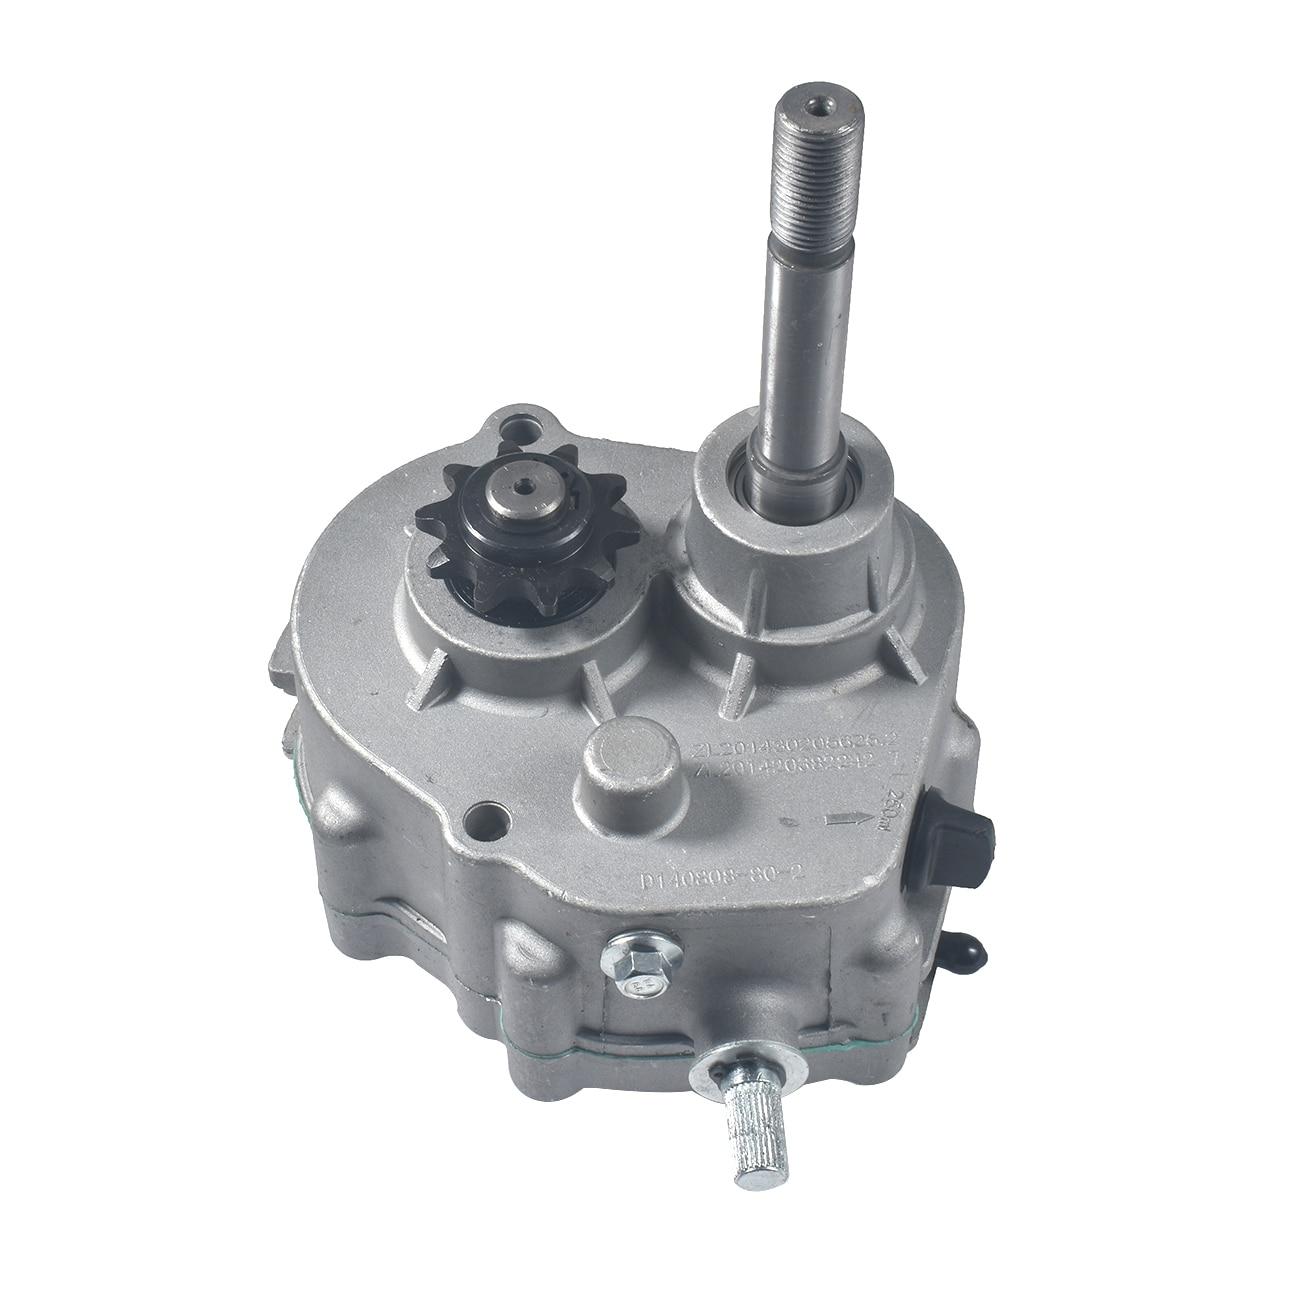 Go Kart Forward Reverse Gear Box 10T  Go Karts Accessories TAV2 30  For 2HP-7HP Engine enlarge